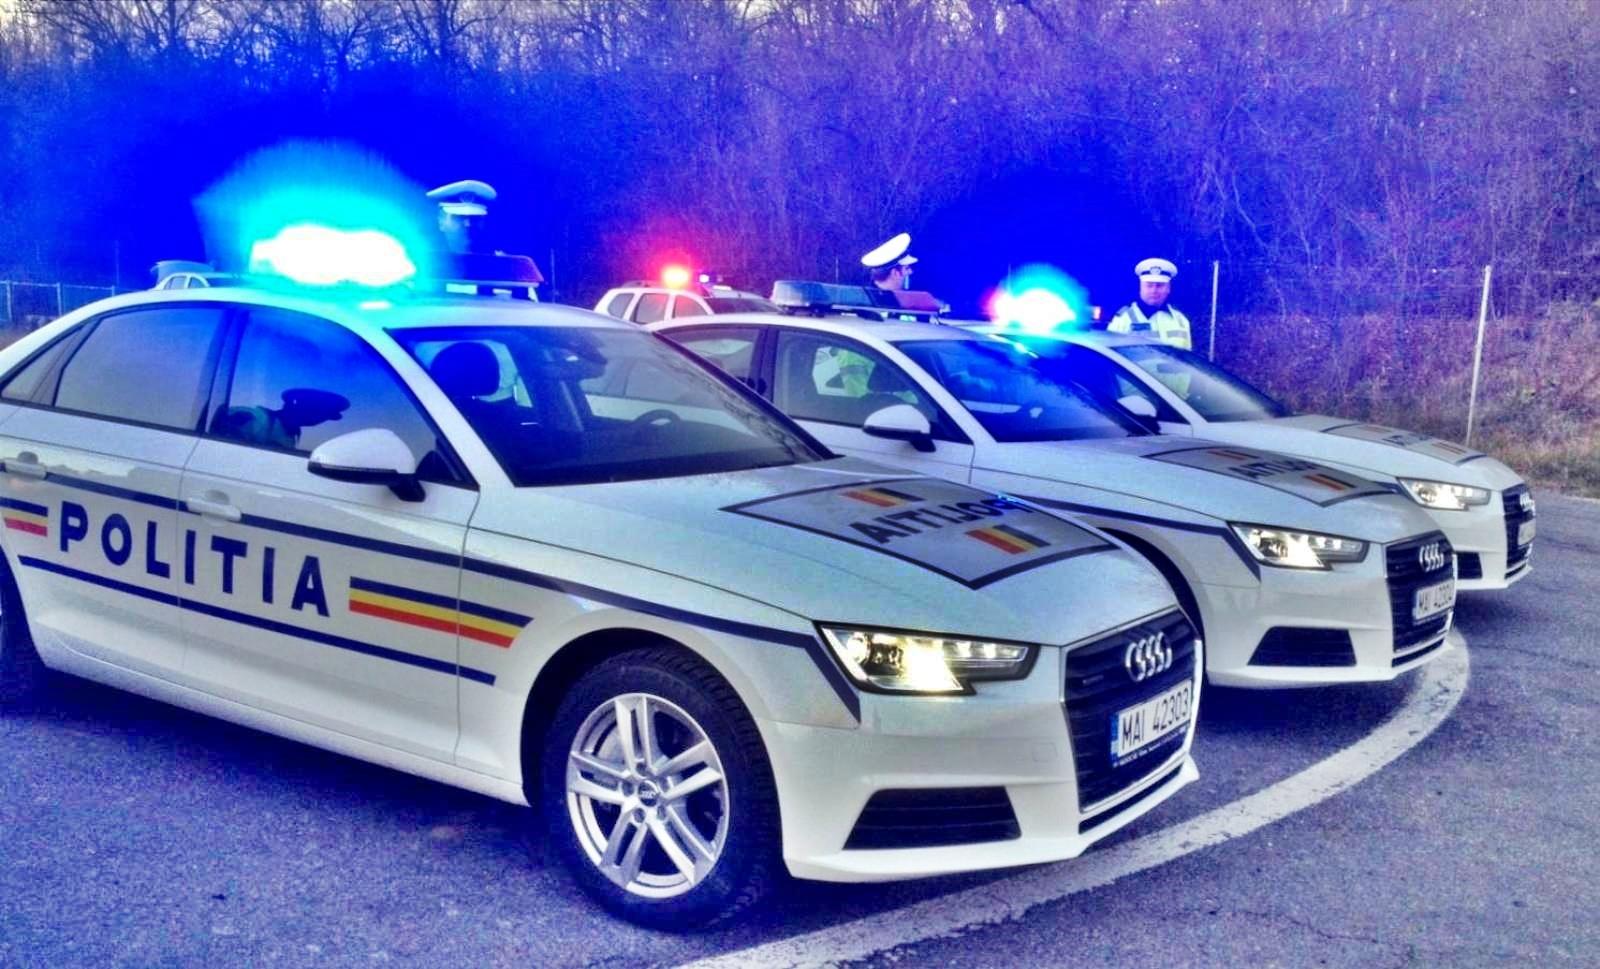 Politia Romana filtru autostrada